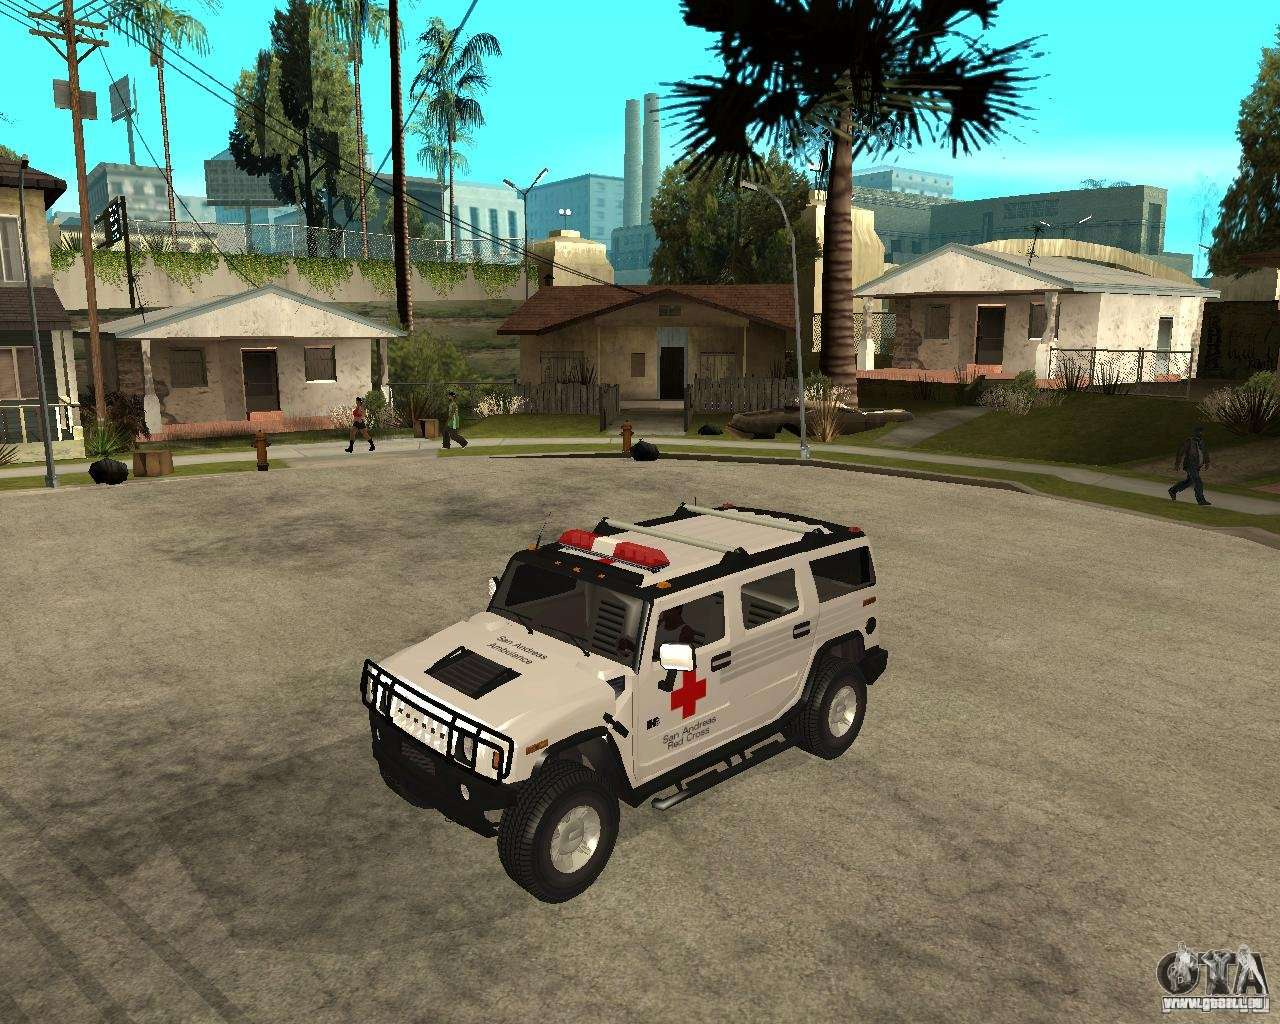 AMG H12 HUMMER - RED CROSS (ambulance) für GTA San Andreas | amg hummer